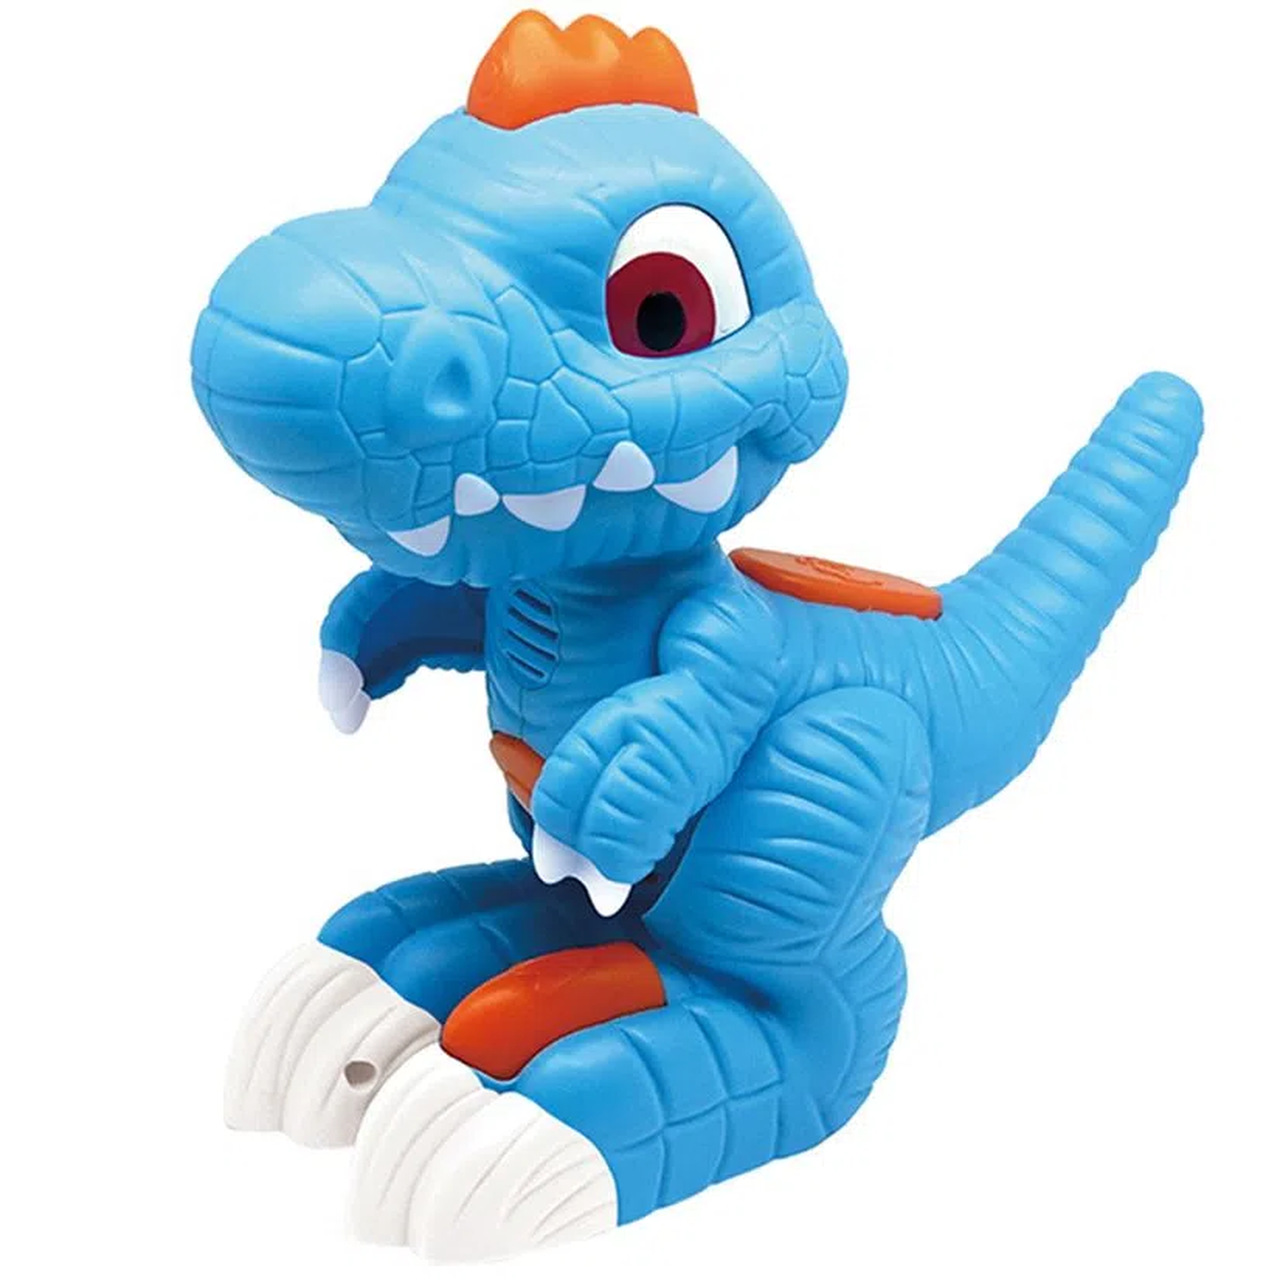 Dinossauro T-Rex Falante (Dino Interativo) Junior Megasaur - FUN